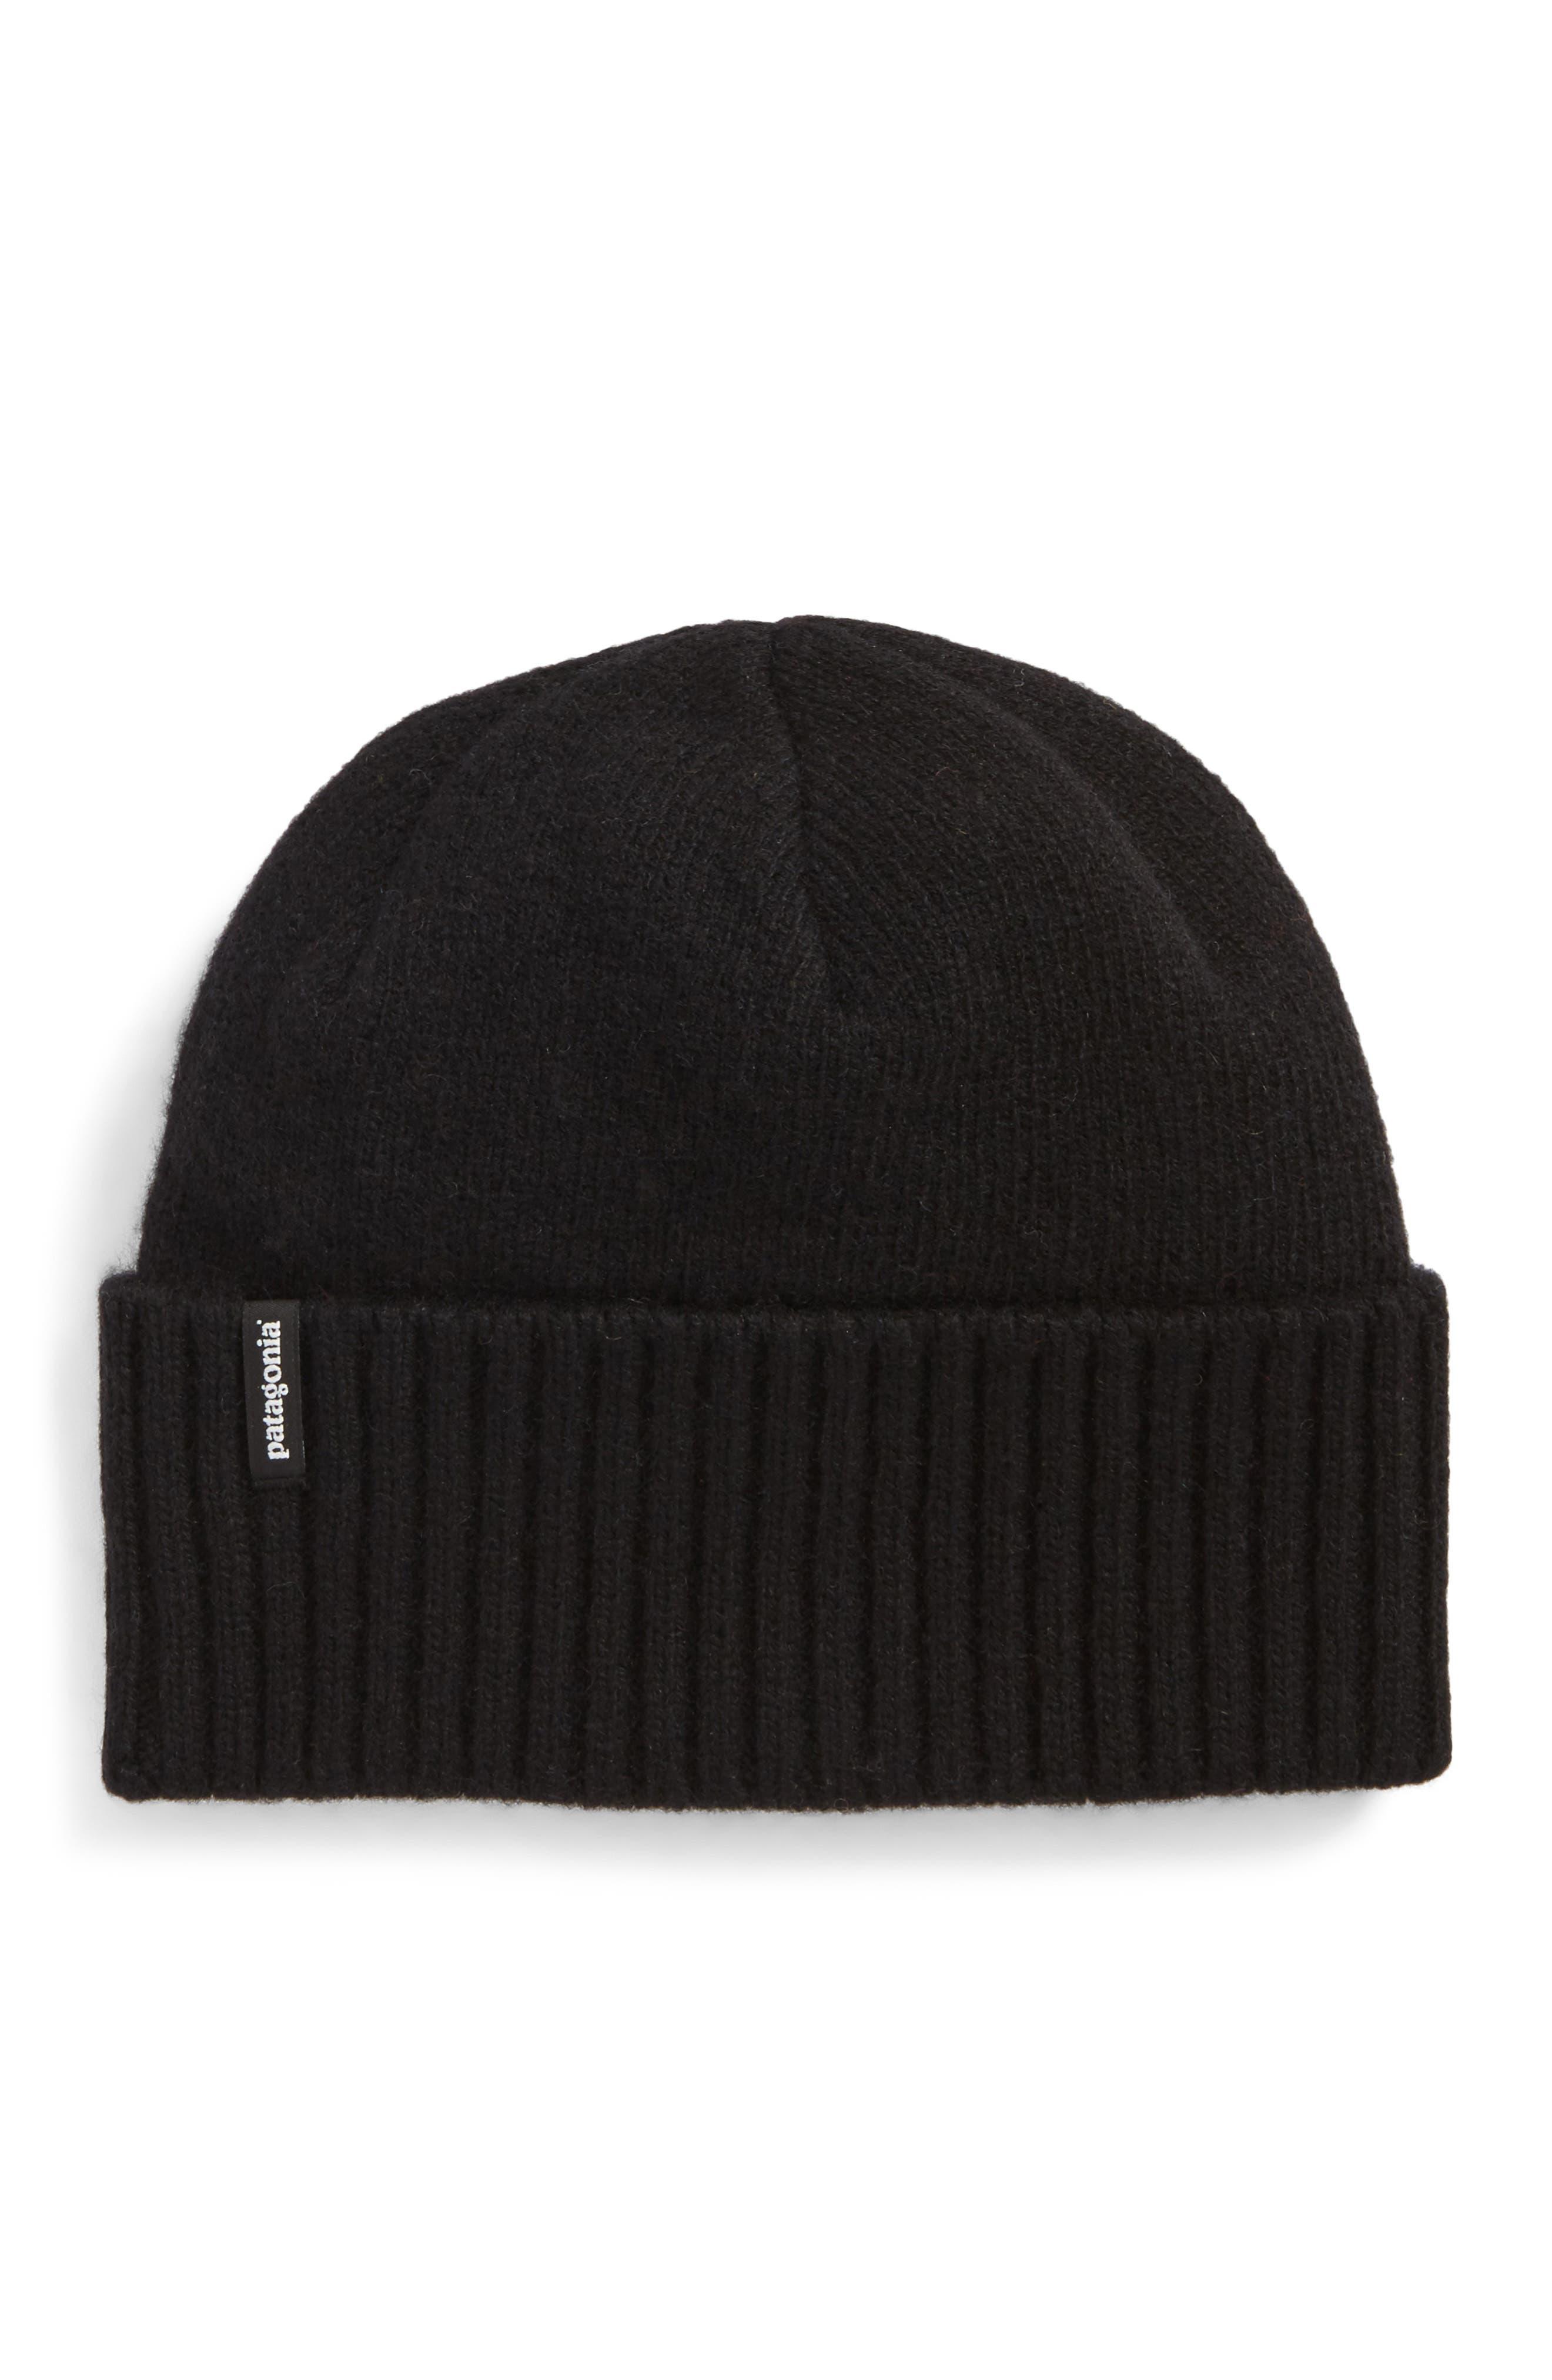 Brodeo Wool Stocking Cap,                         Main,                         color, 001